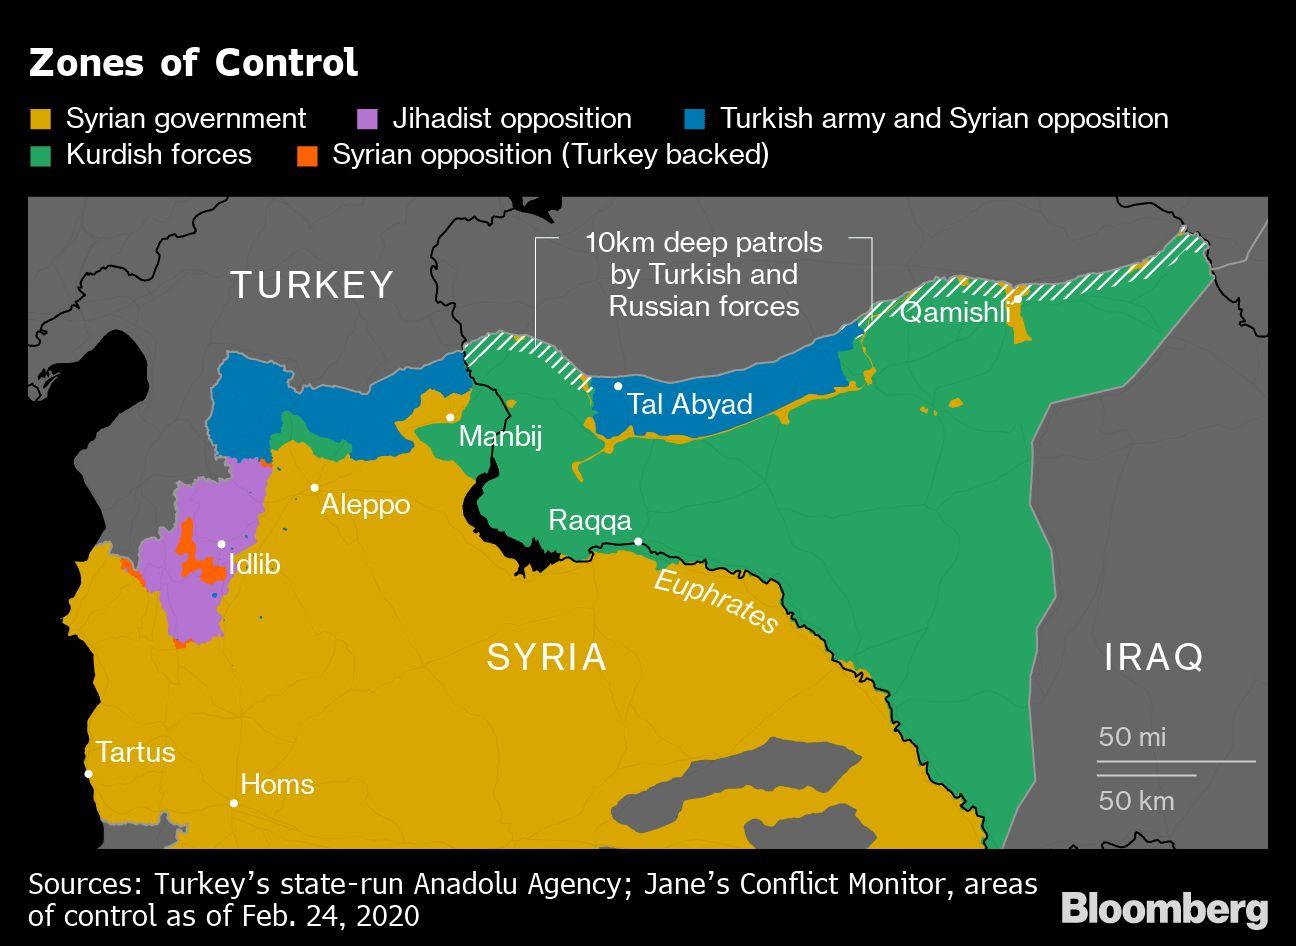 Europe Risks New Migration Meltdown as Erdogan Opens Floodgates